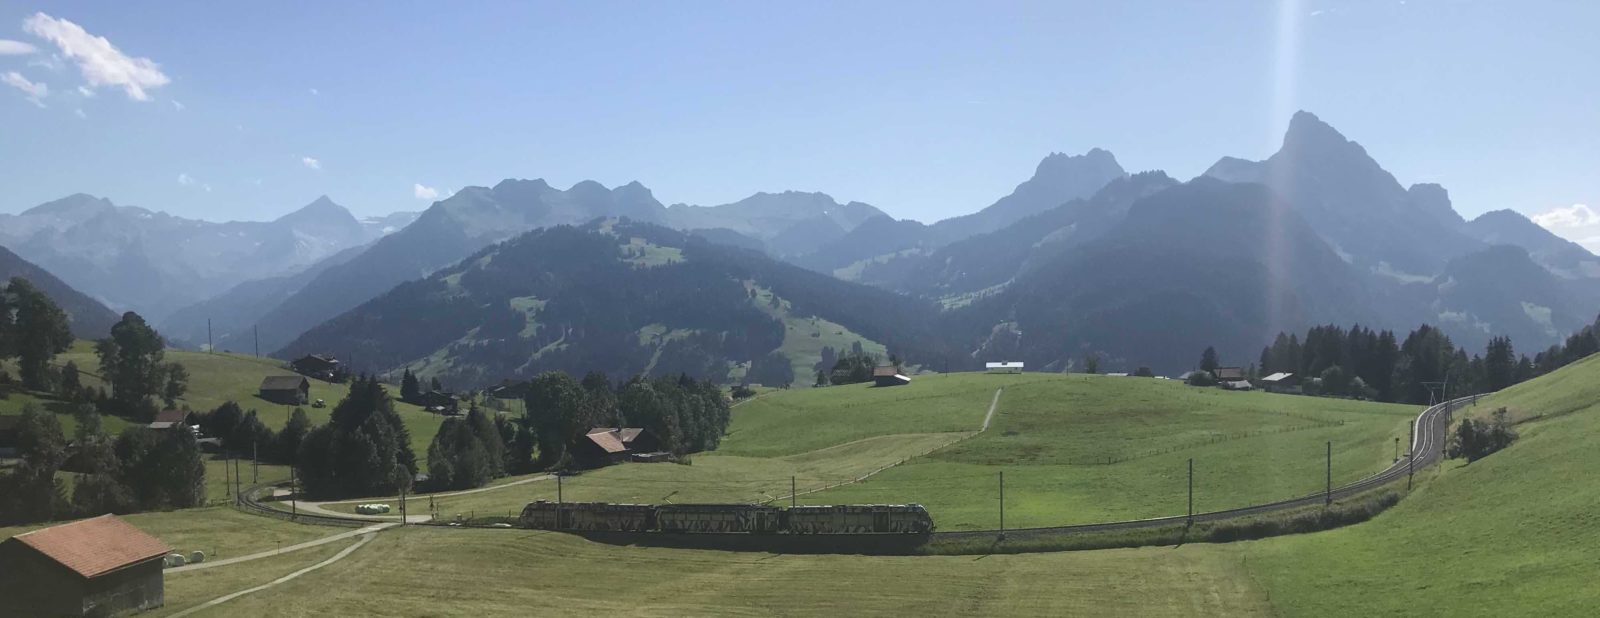 Mirage Gstaad avec train MOB